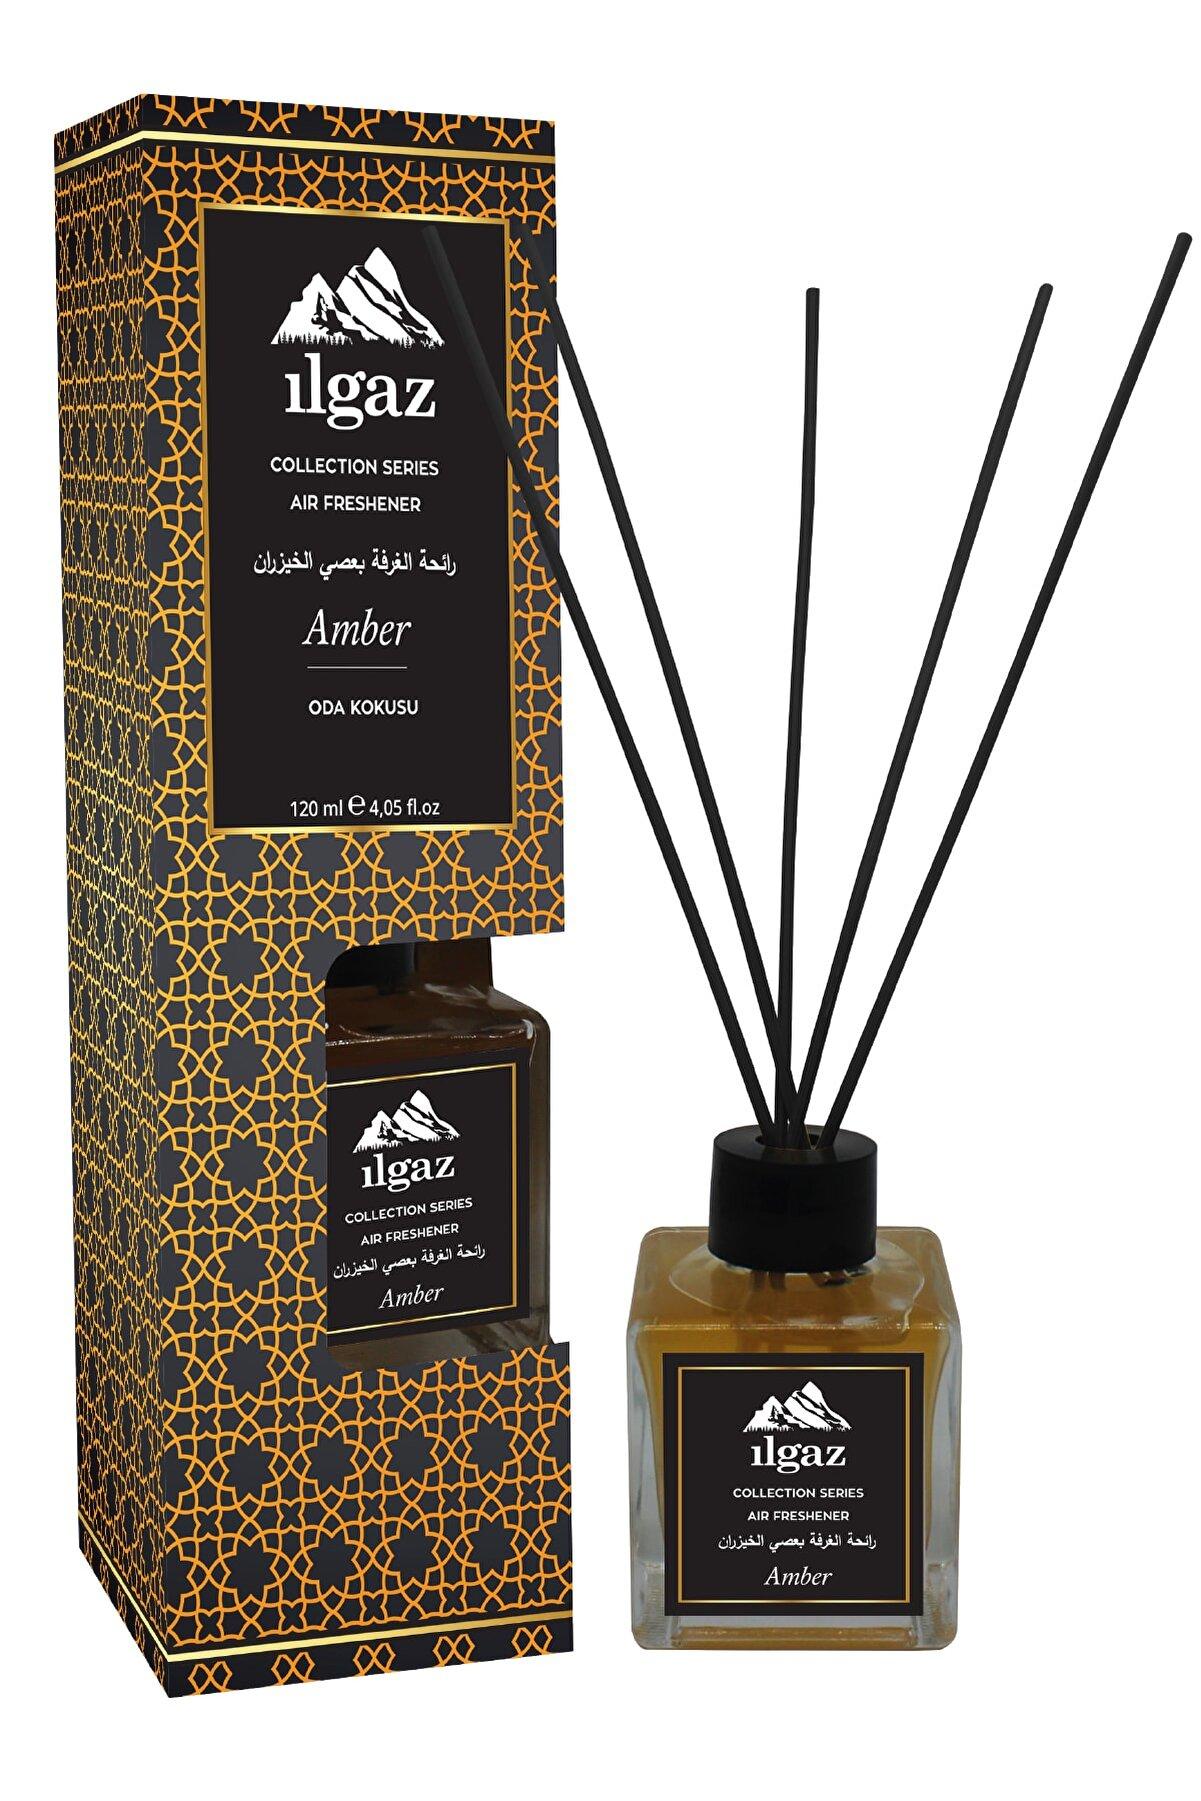 ILGAZ Collection Misk Amber Oda Kokusu Bambu Çubuklu Oda Parfümü 120 ml